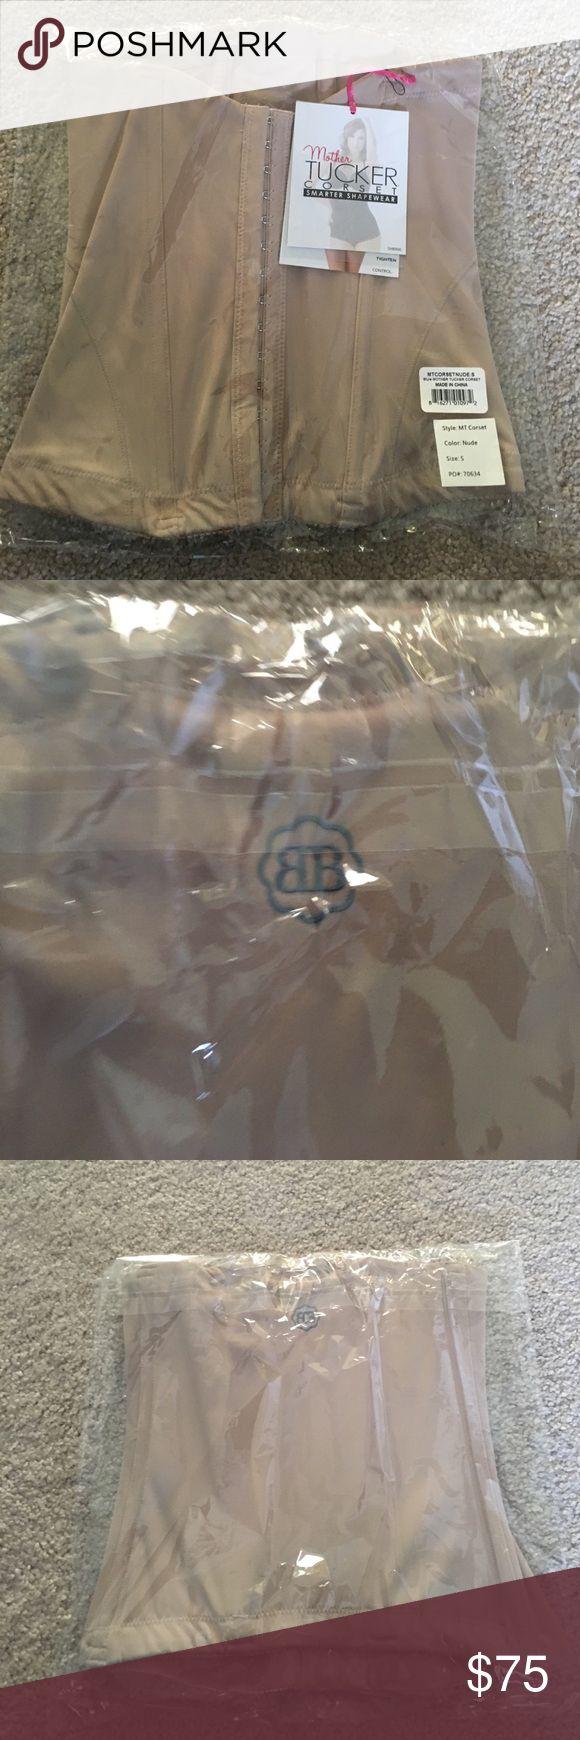 Belly Bandit waist trainer corset shapewear Size small, nude. Corset style waist trainer. Never worn, still in packaging. Belly Bandit Intimates & Sleepwear Shapewear